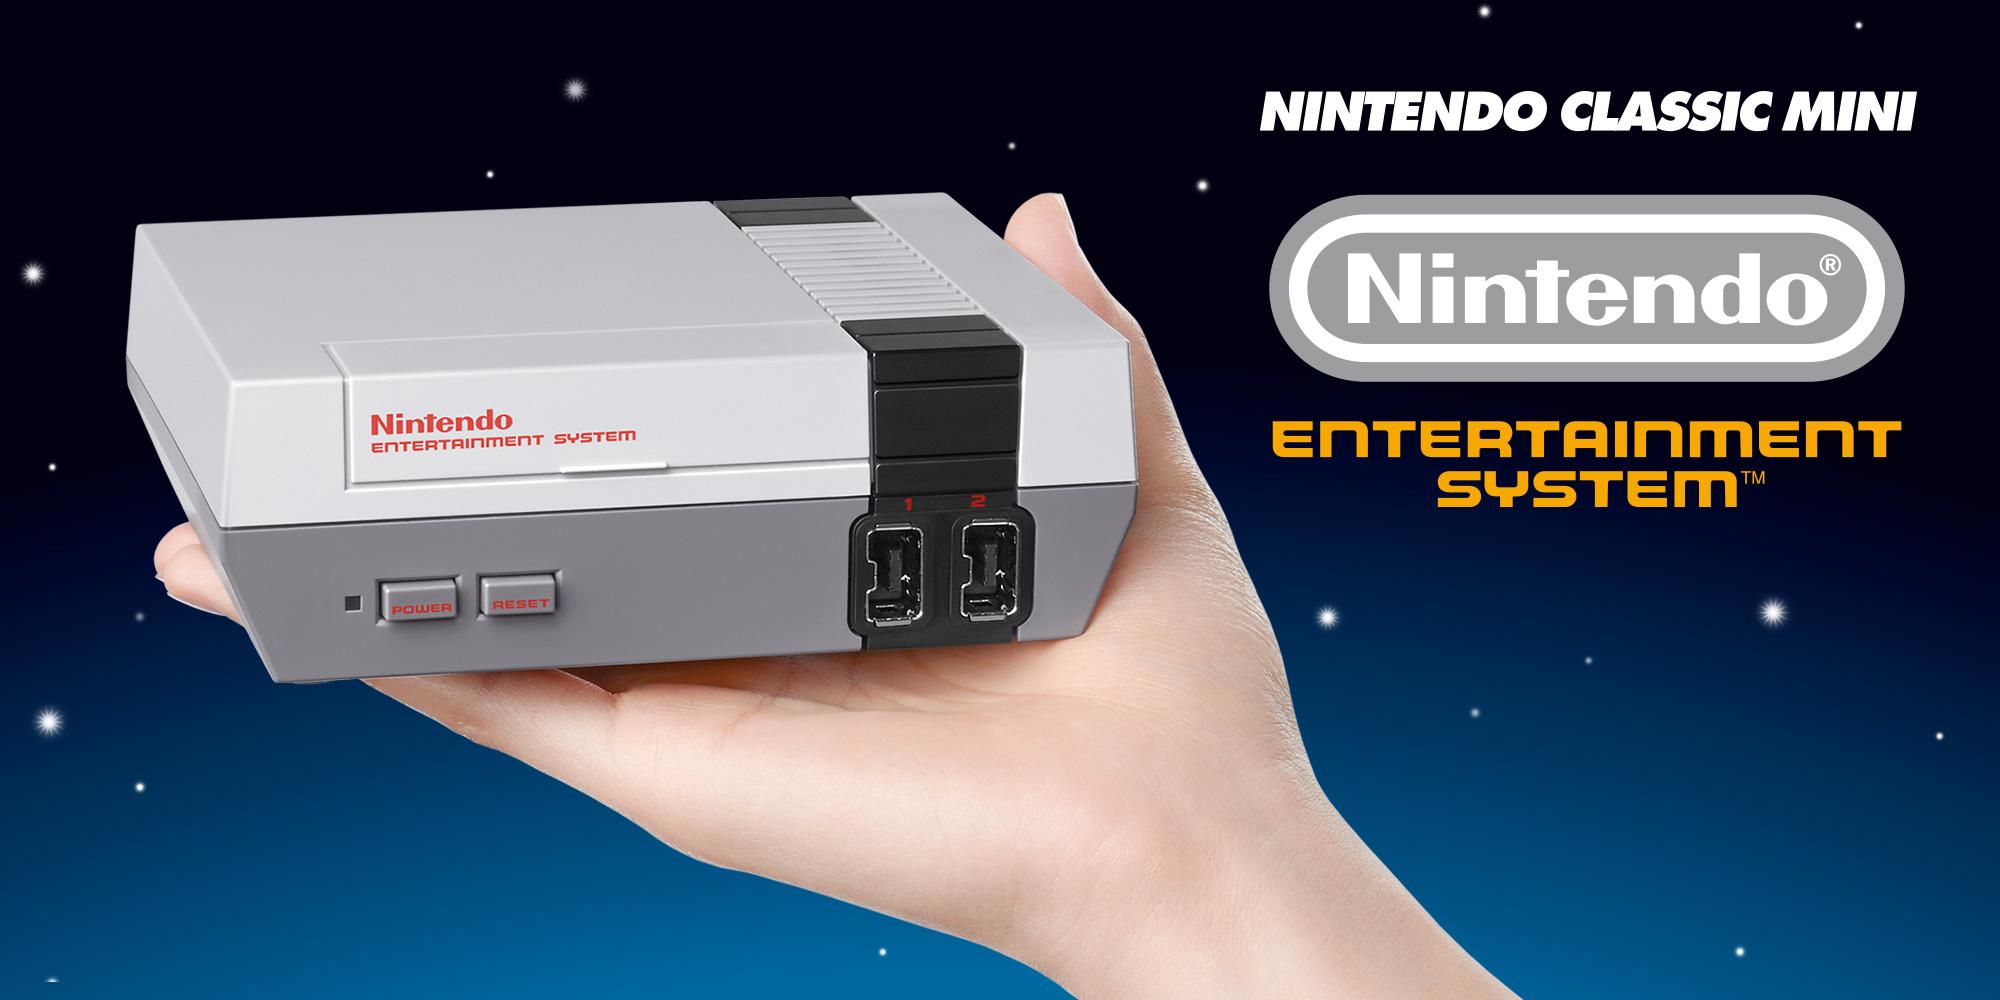 Retro-und Minikonsolen #2 NES Classic Mini: Nintendos erste Konsole im Miniformat